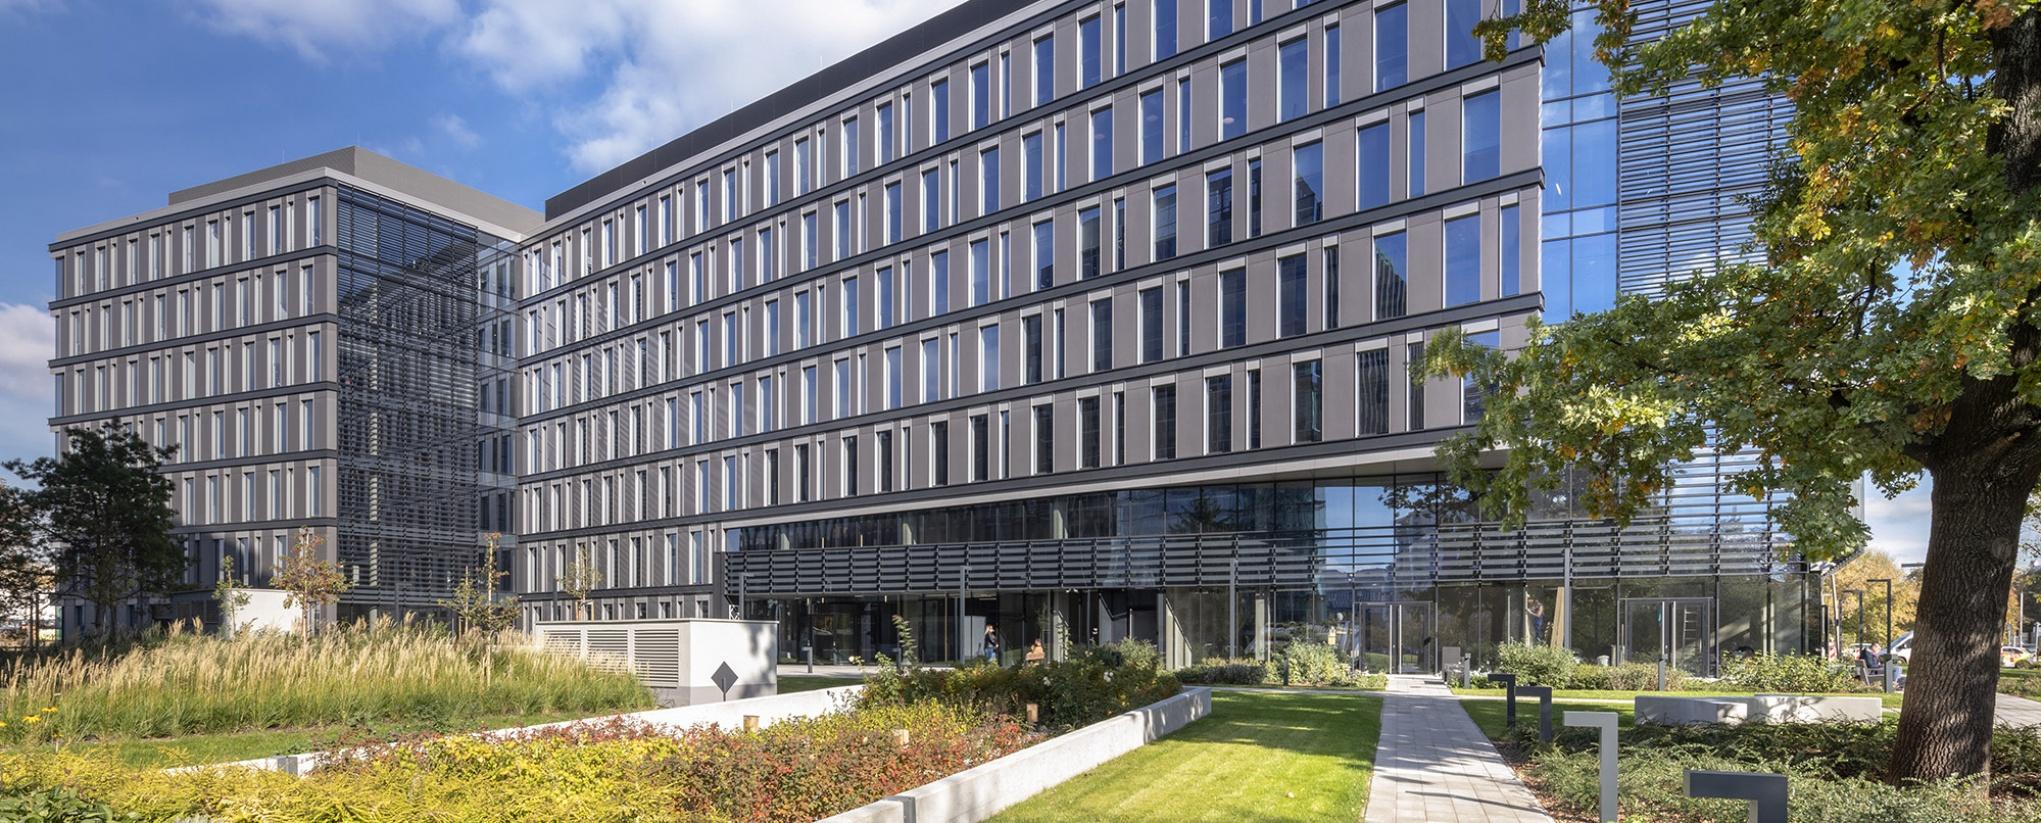 Warsaw,Office,ul. Domaniewska 28,1008